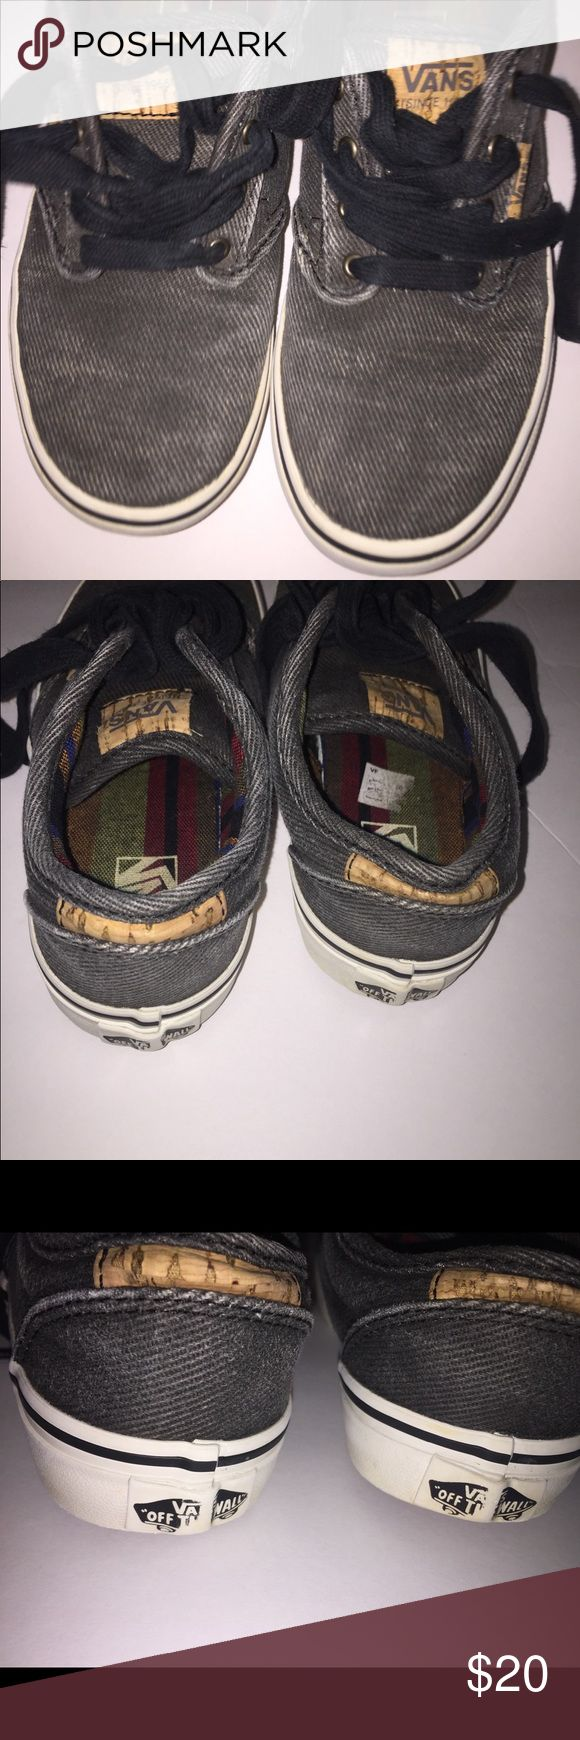 Boys low vans sneakers size 2.5 youth Boys low vans sneakers size 2.5 youth. Grayish black color Vans Shoes Sneakers